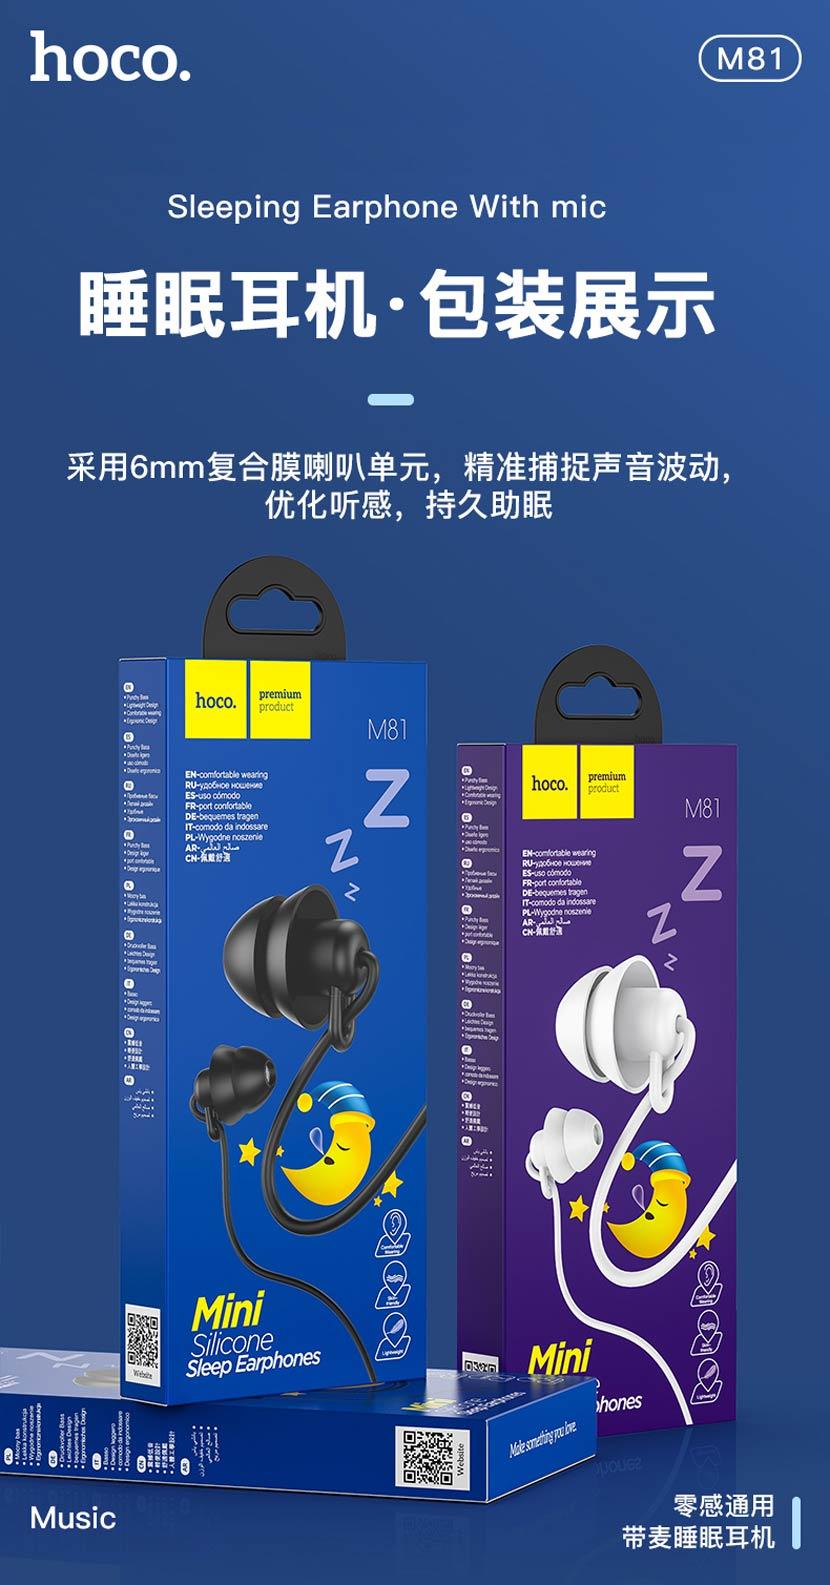 hoco news m81 imperceptible sleeping earphones with mic package cn